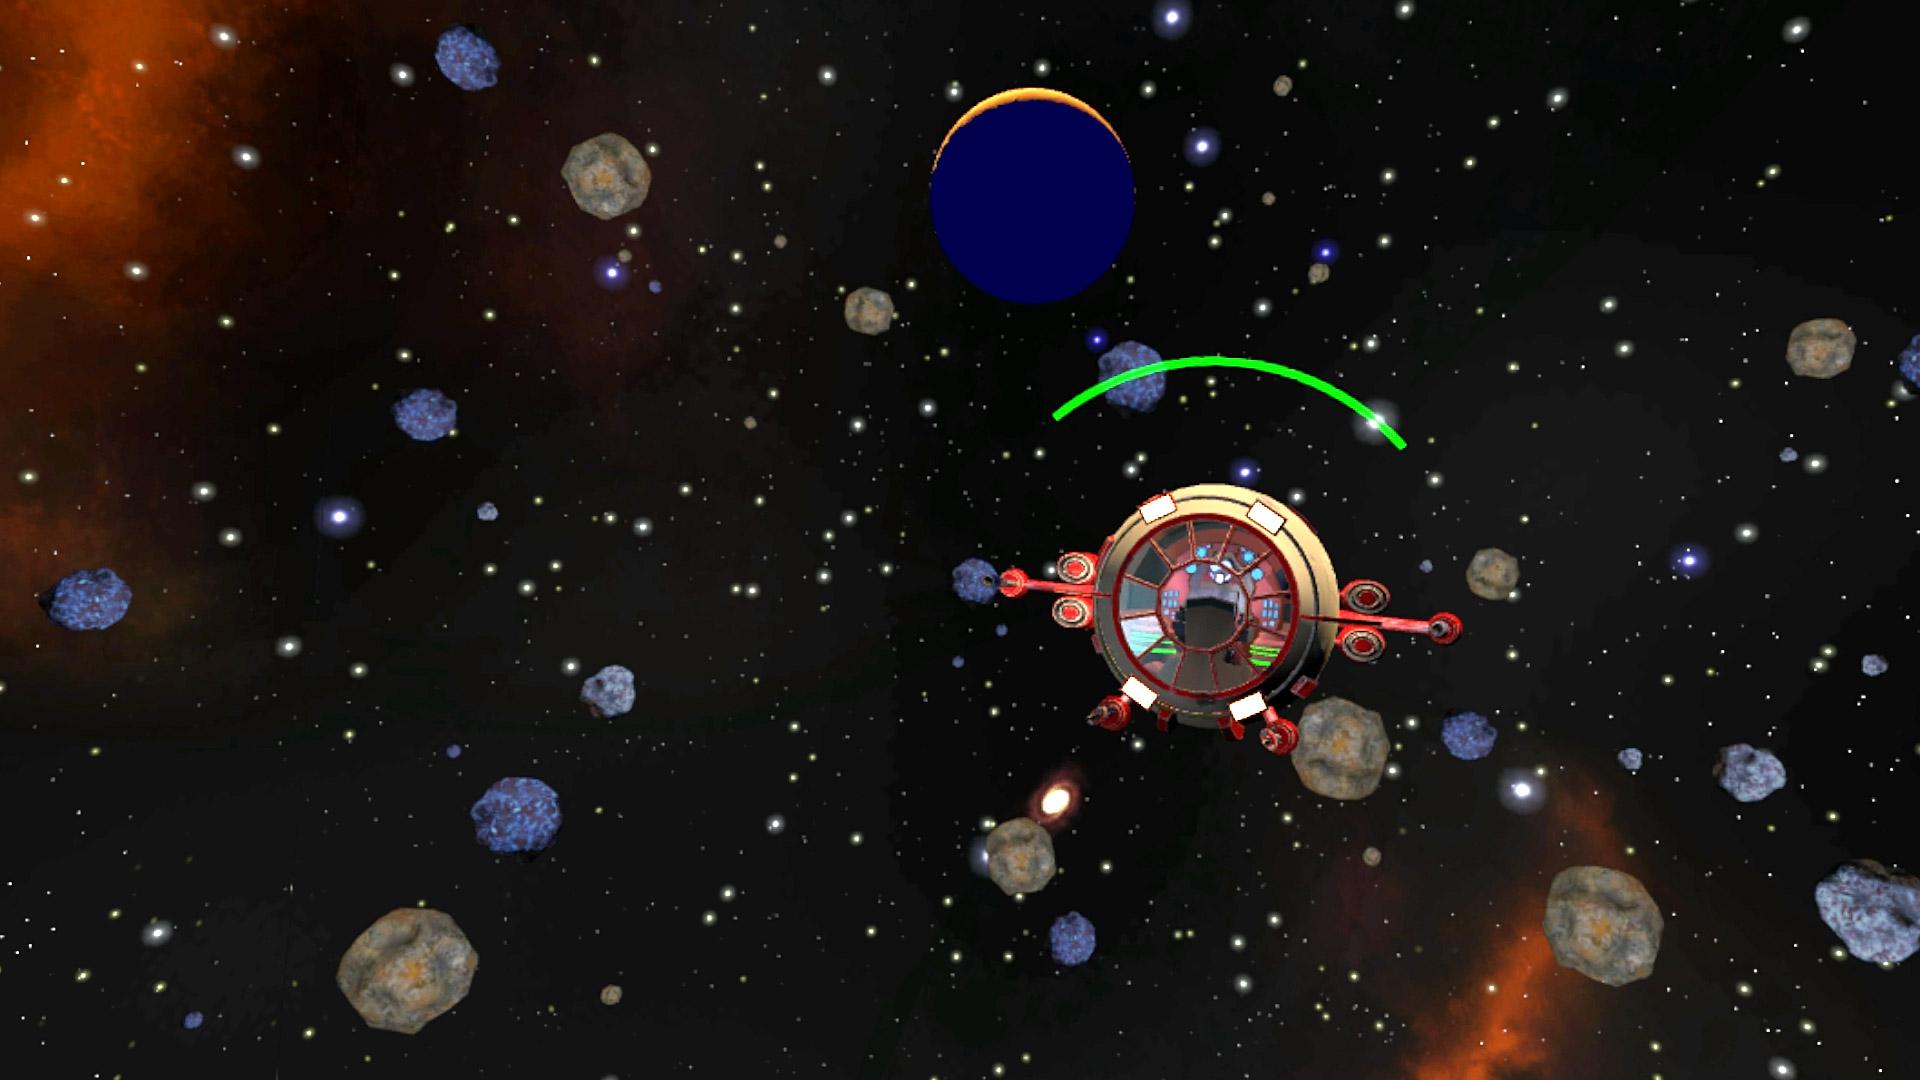 Oculus Quest 游戏《Space Junk》宇宙垃圾插图